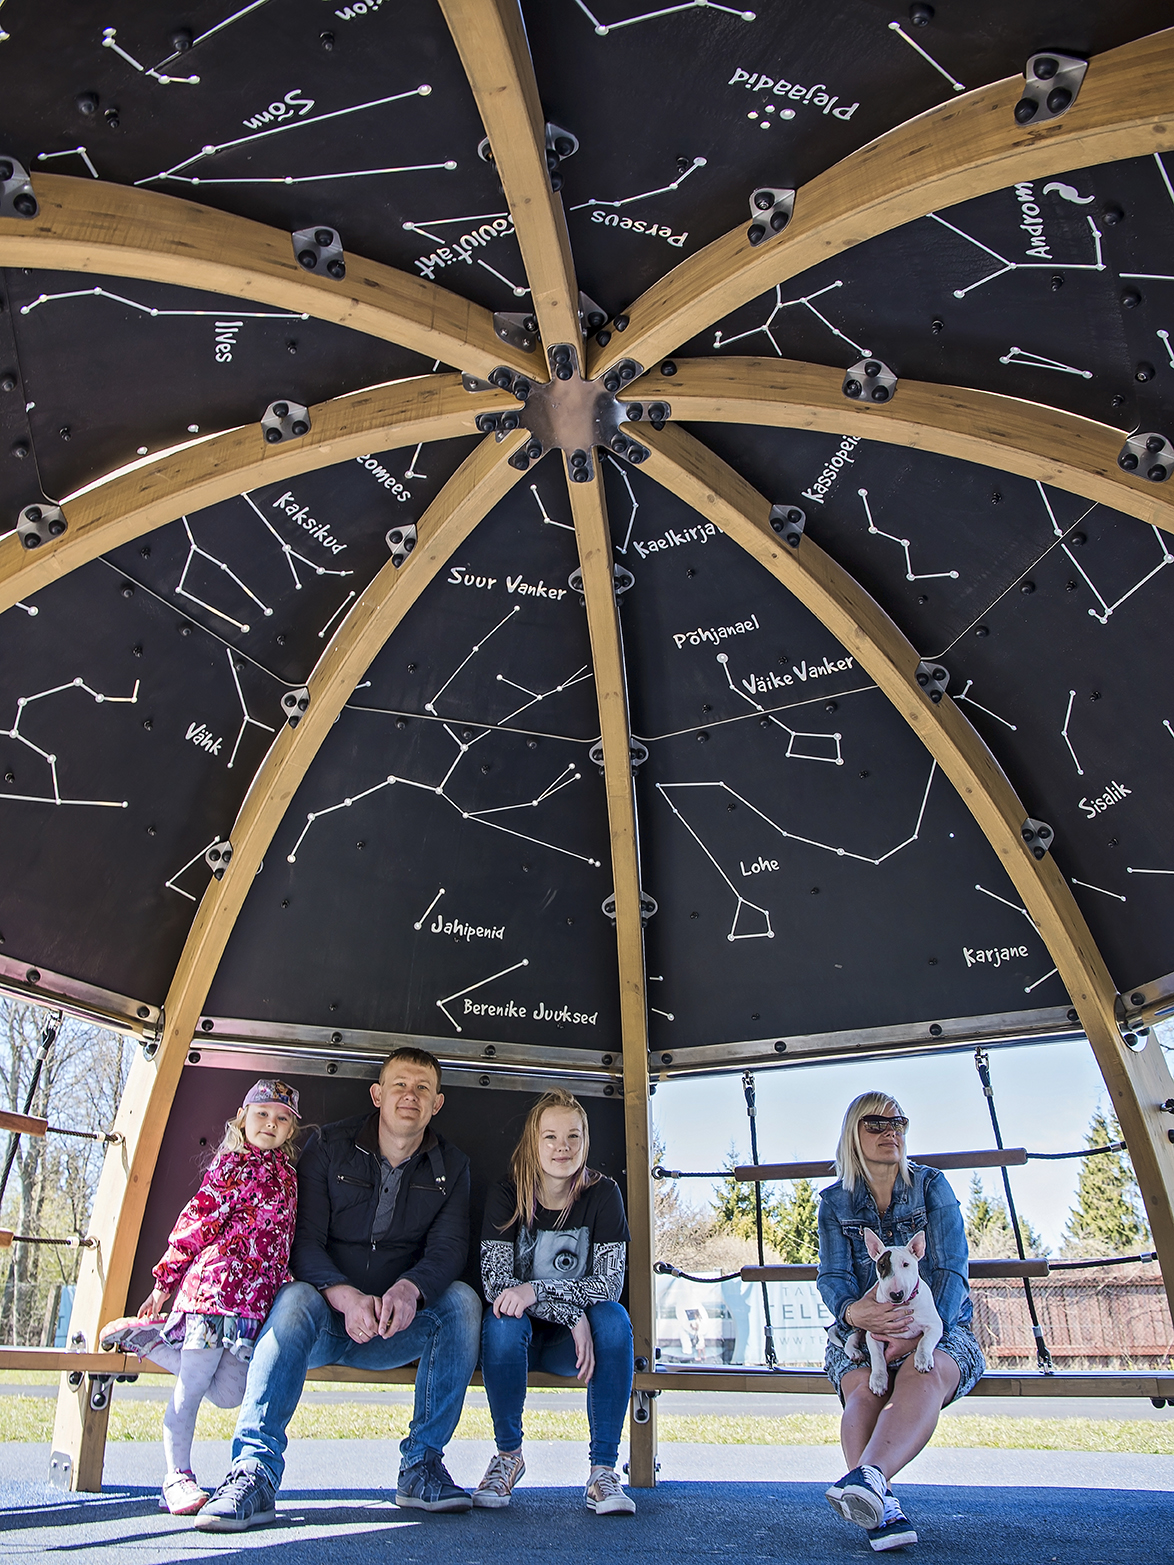 inside-planetarium.jpg